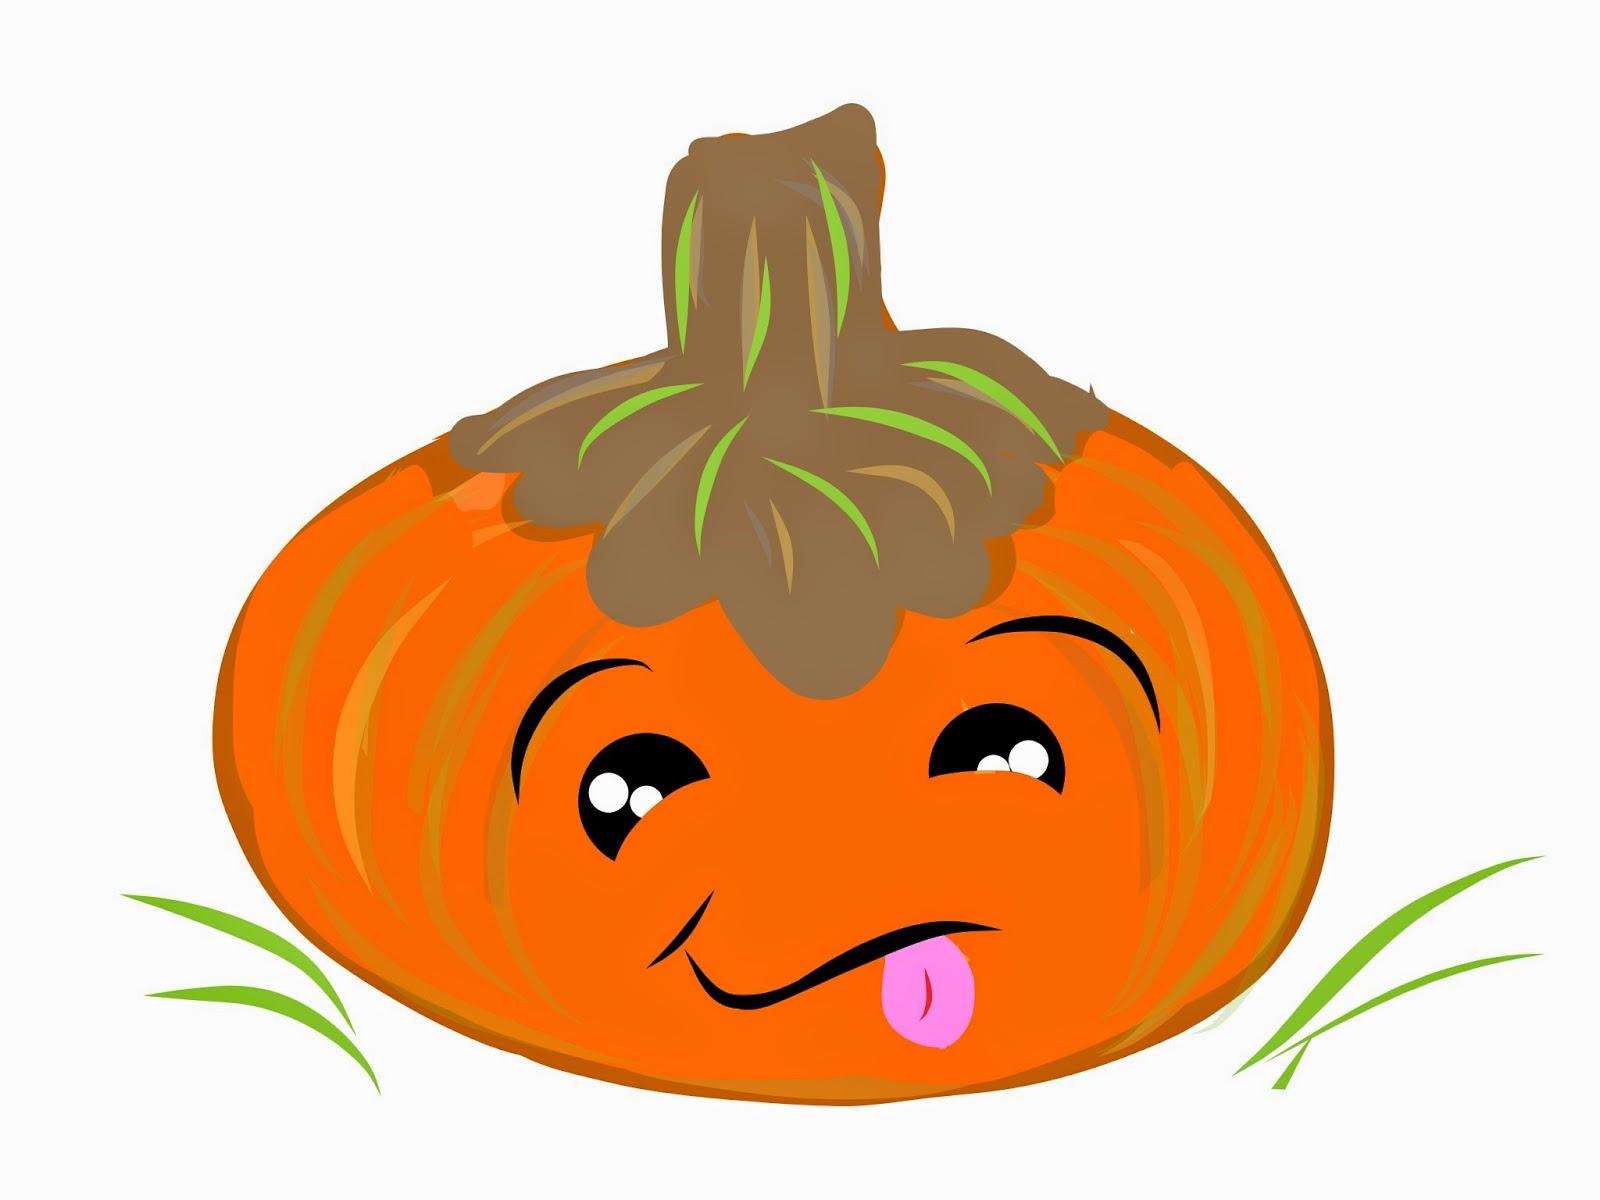 Emoji Pumpkin Clip Art Pumpkin Emoji Emoji Pumpkin Clip Art